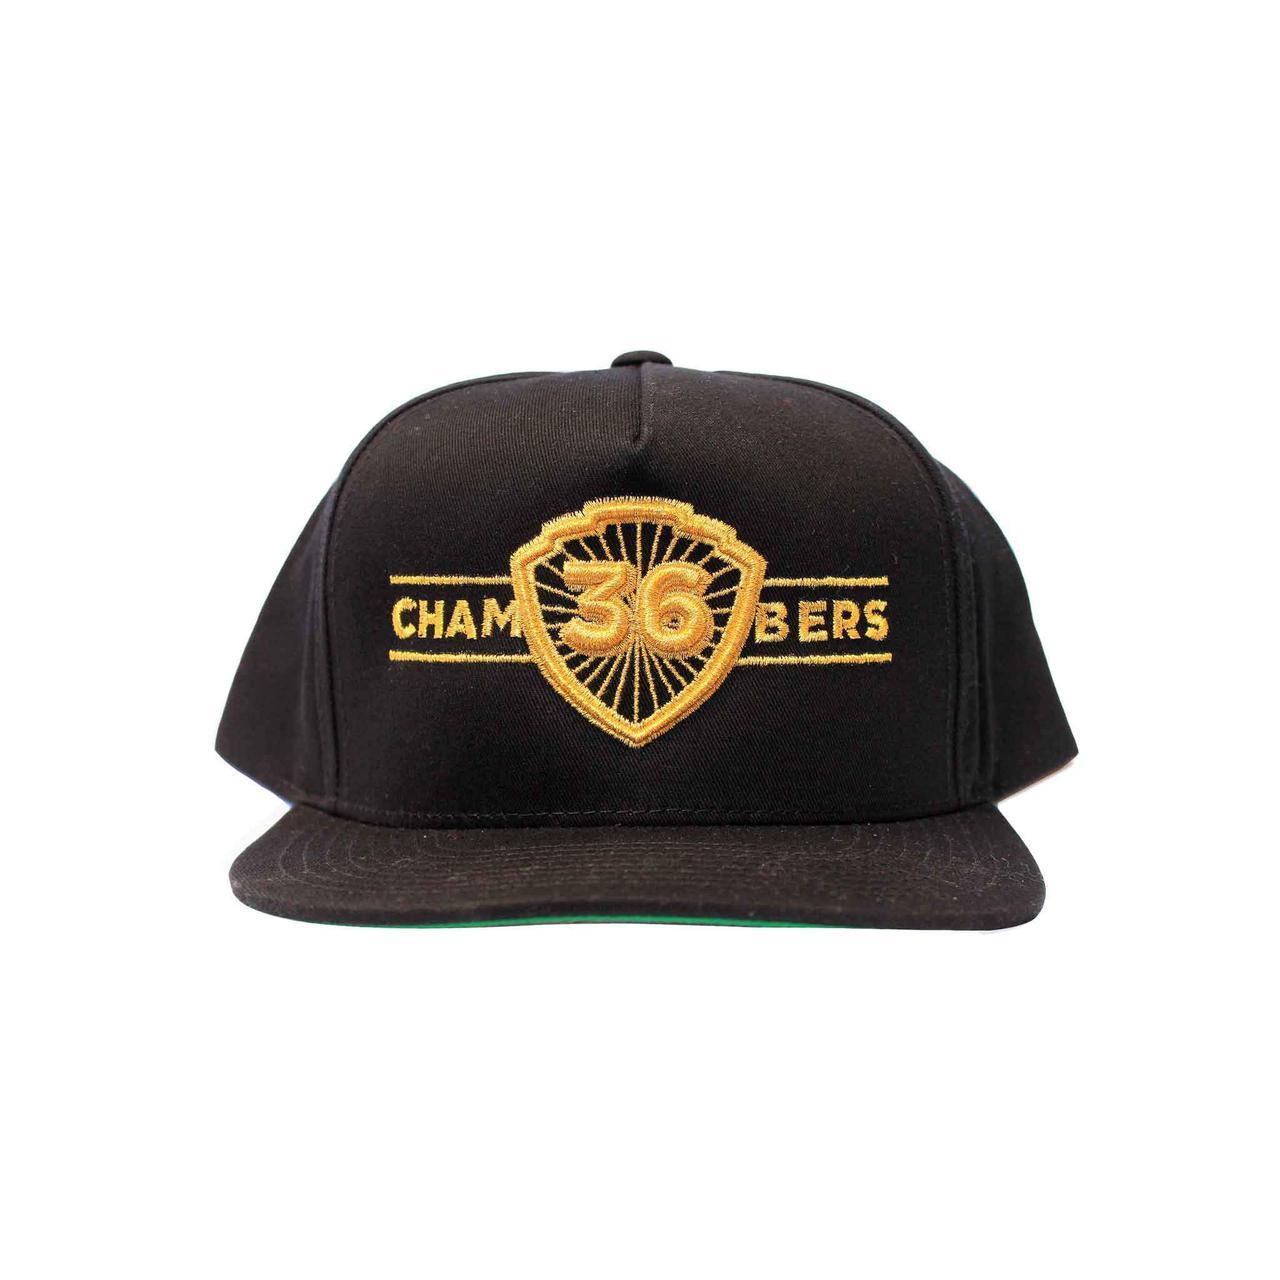 Wu-Tang Clan 36th Chamber Shield Hat d3c7a1be85a